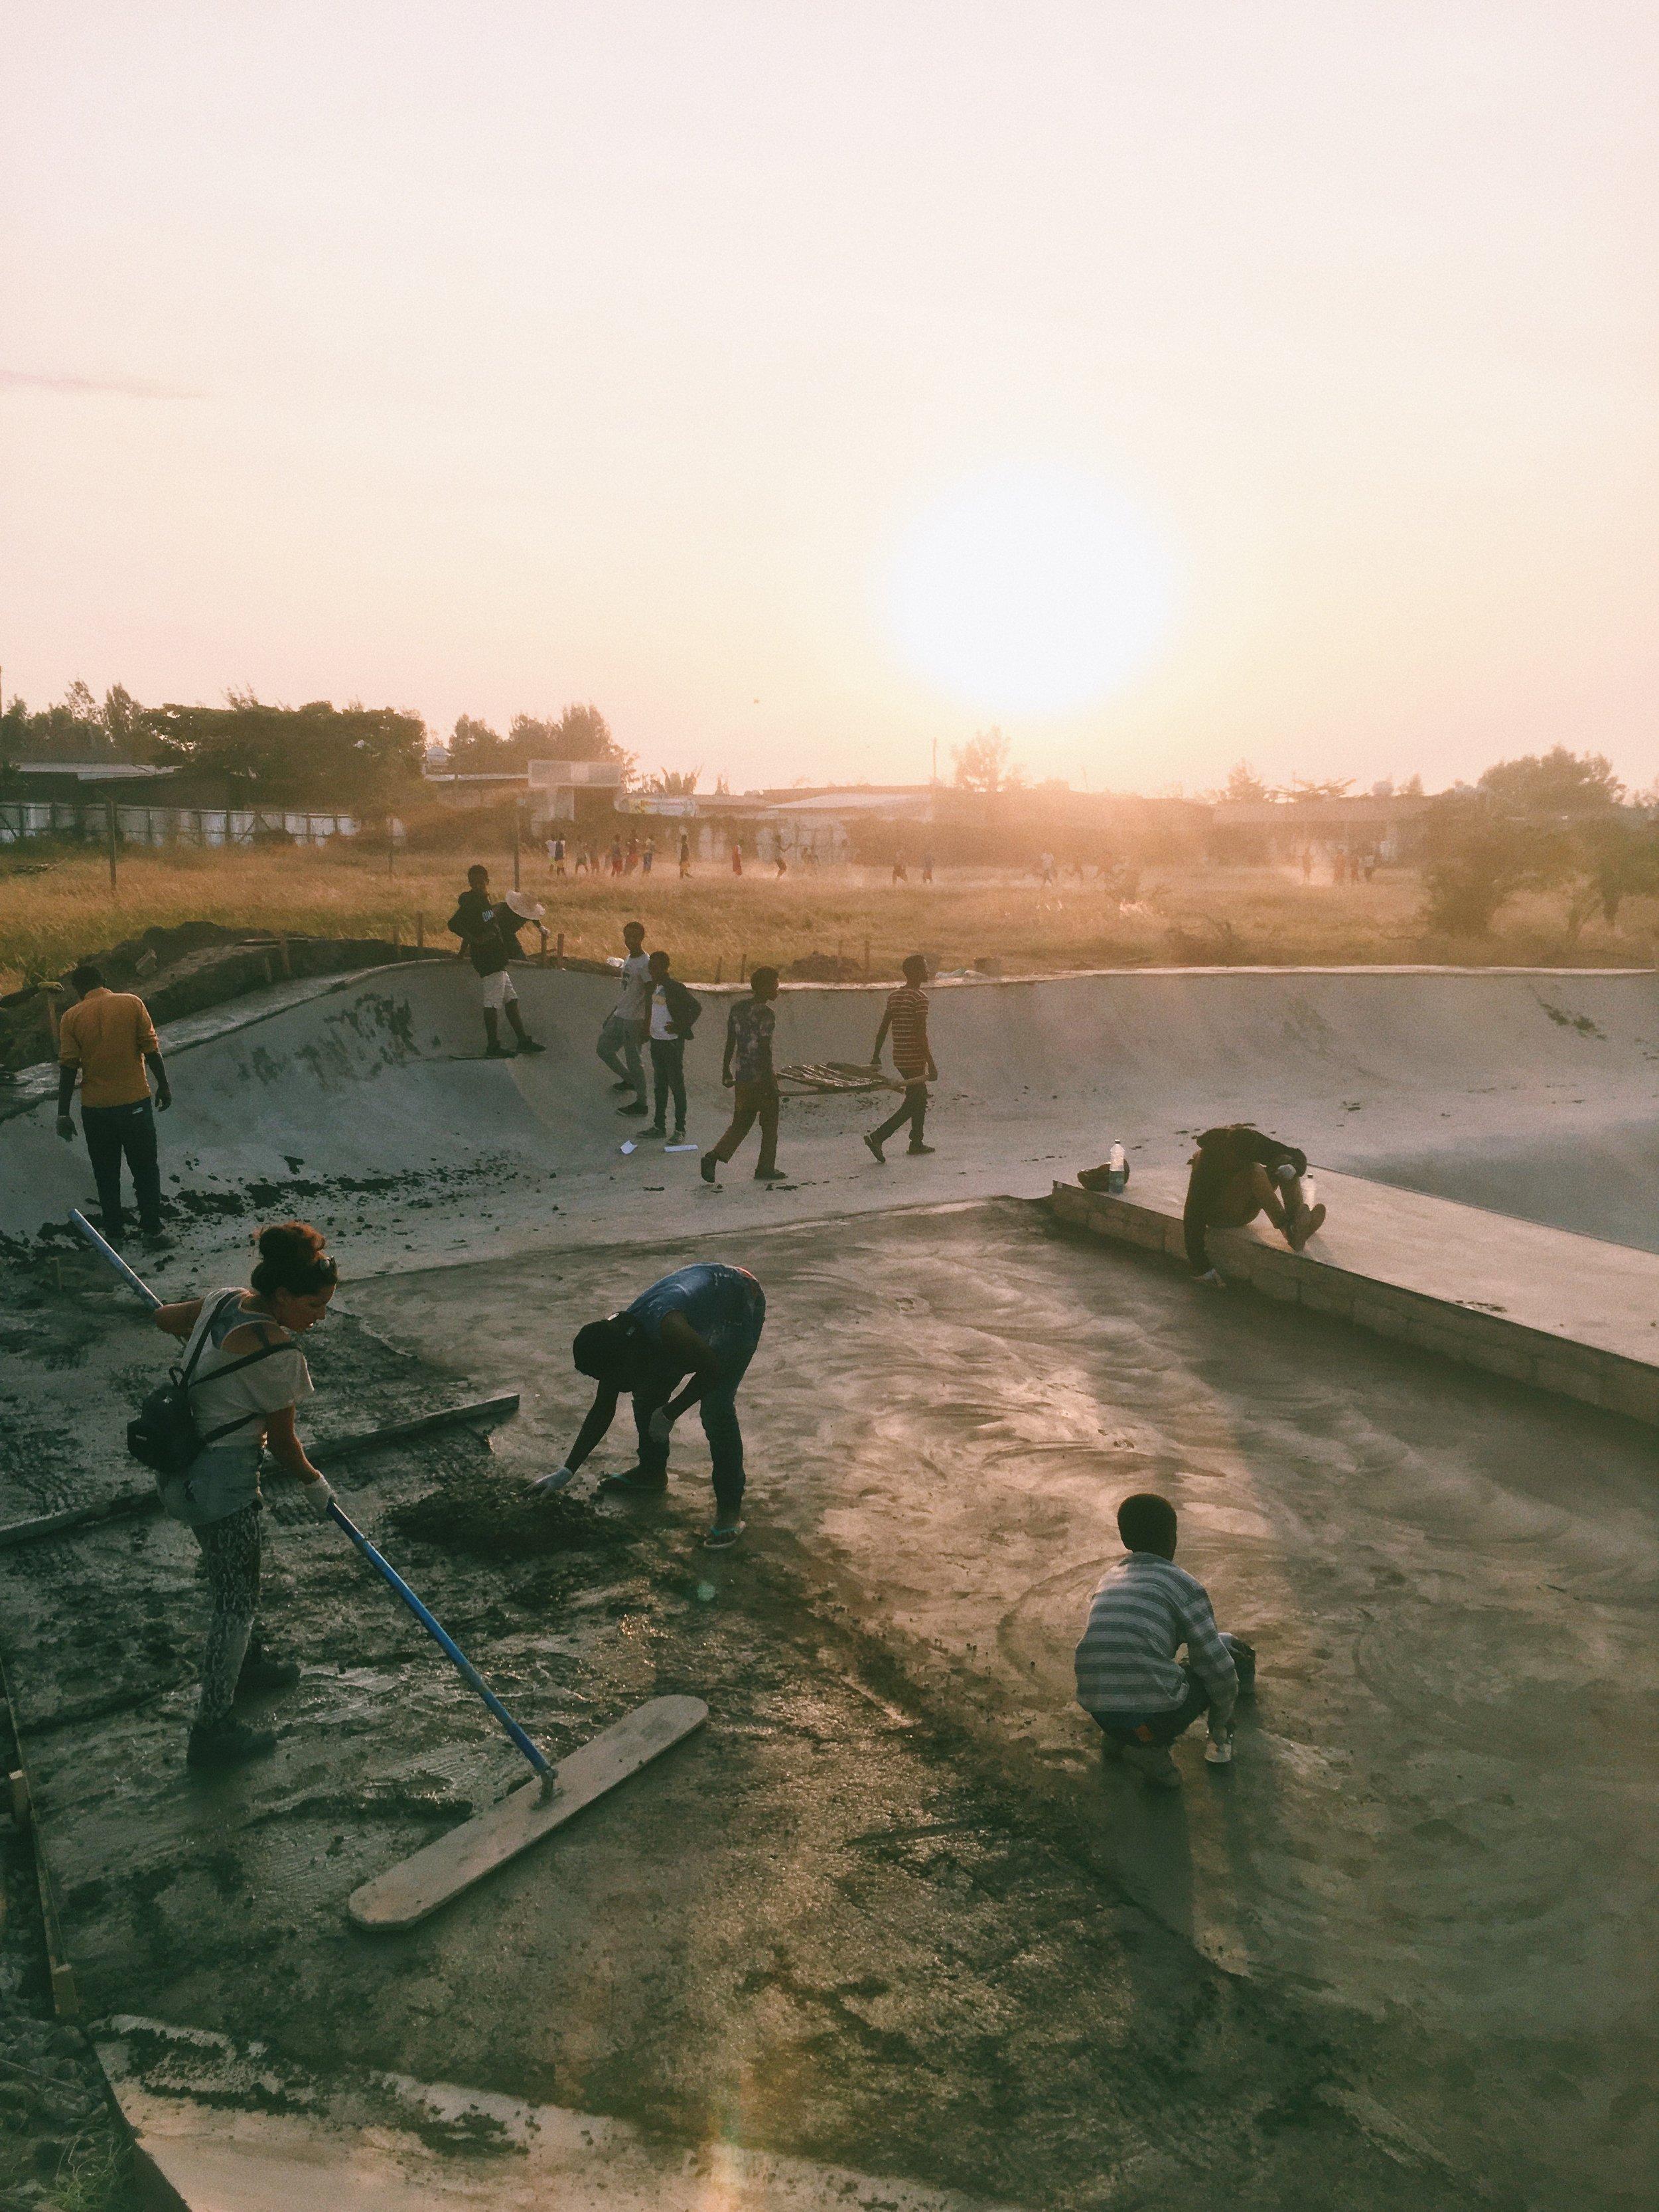 Lake Hawassa Skatepark Build, Ethiopia - Photo: Ben Hermans